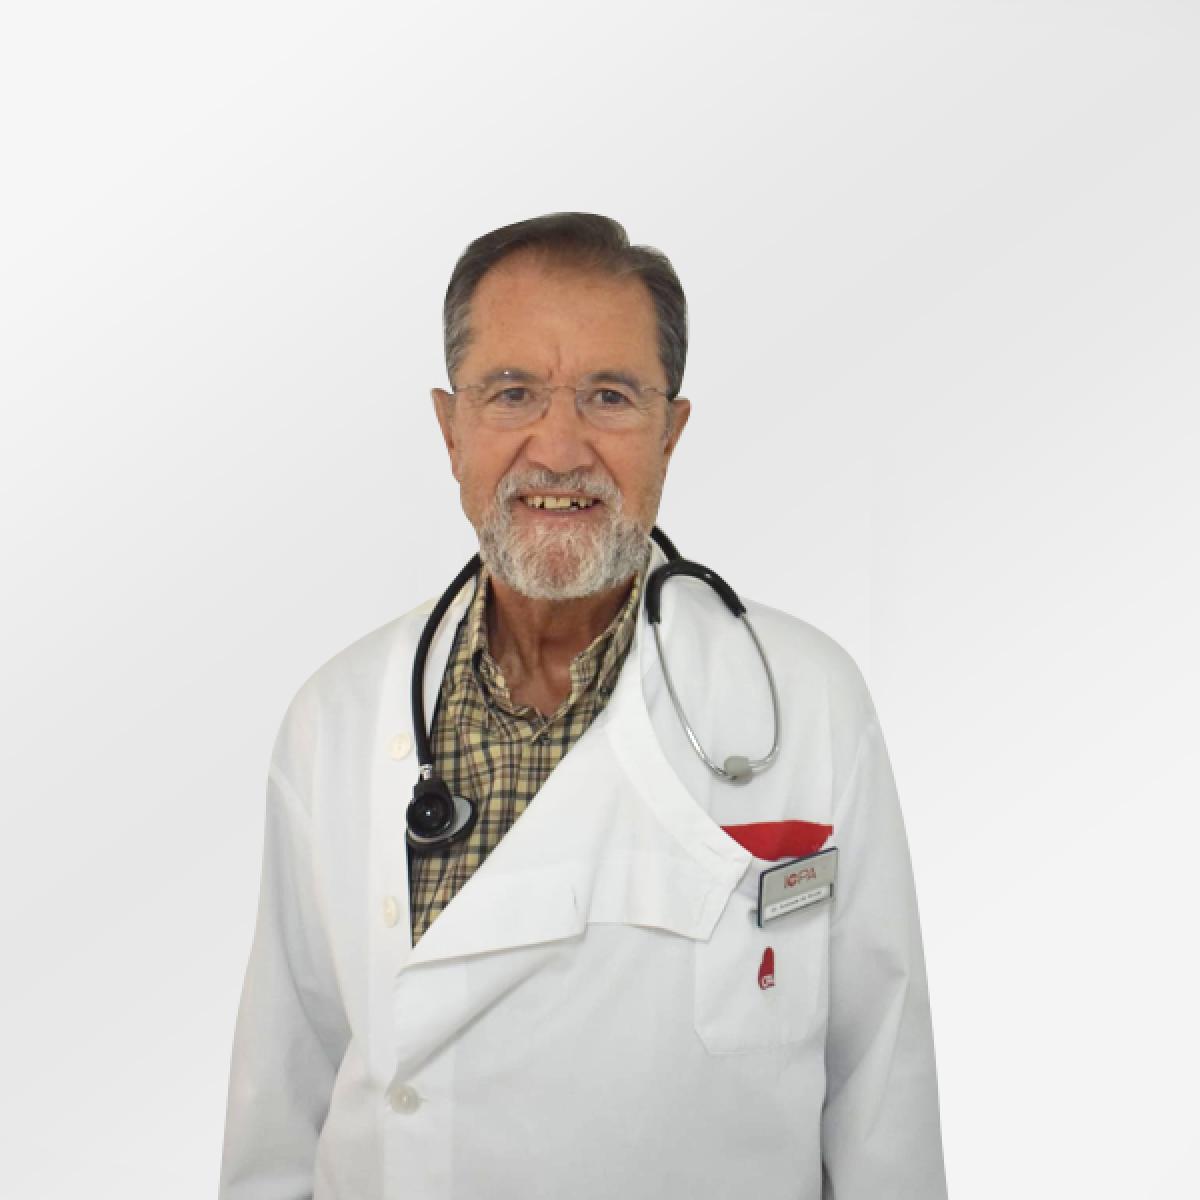 Dr. Andrade Sousa